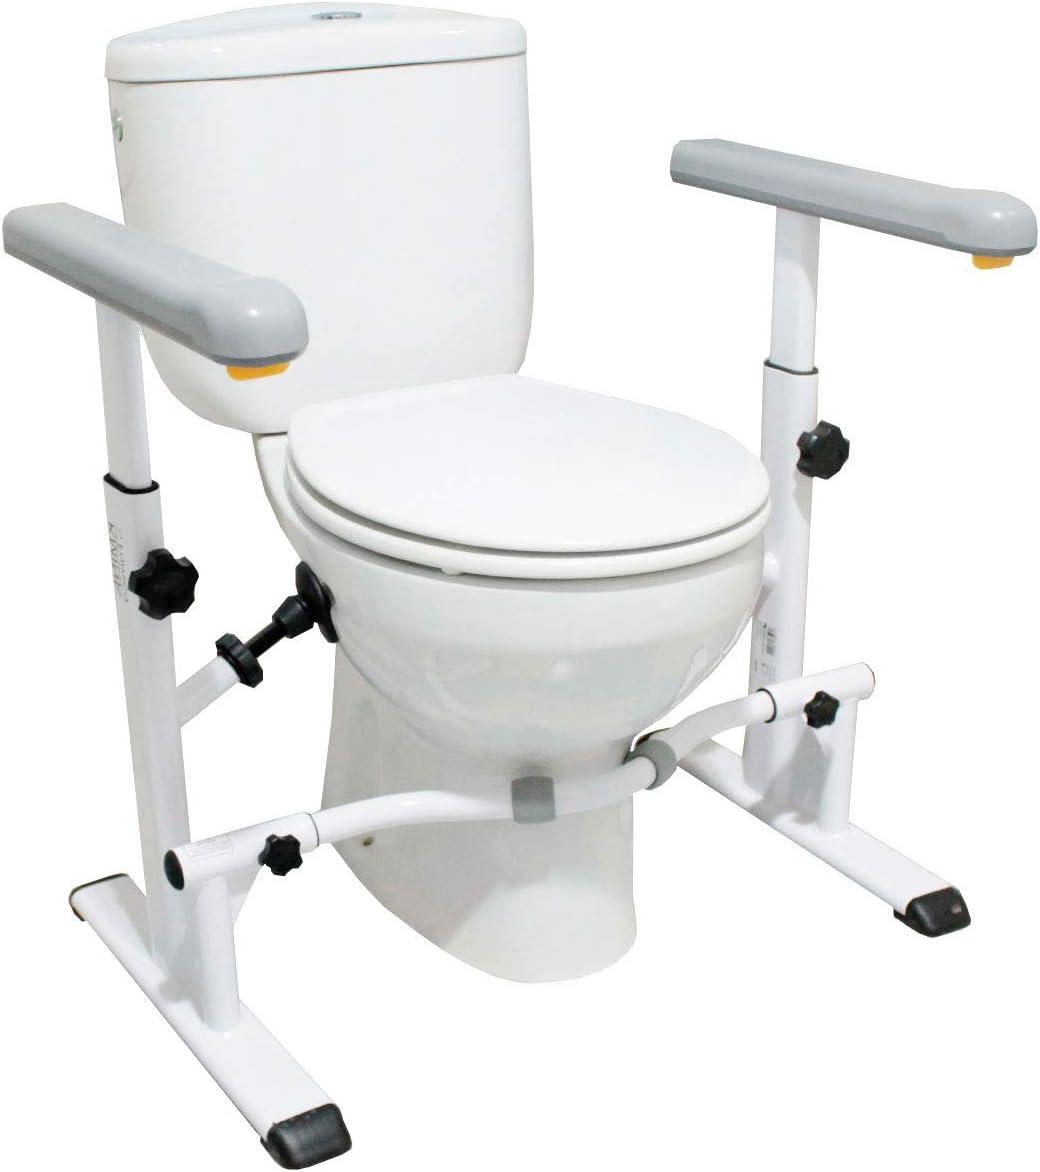 KMINA - Barra de baño minusvalidos, Asideros baño, Reposabrazos inodoro, Barra WC minusvalidos, Barra inodoro